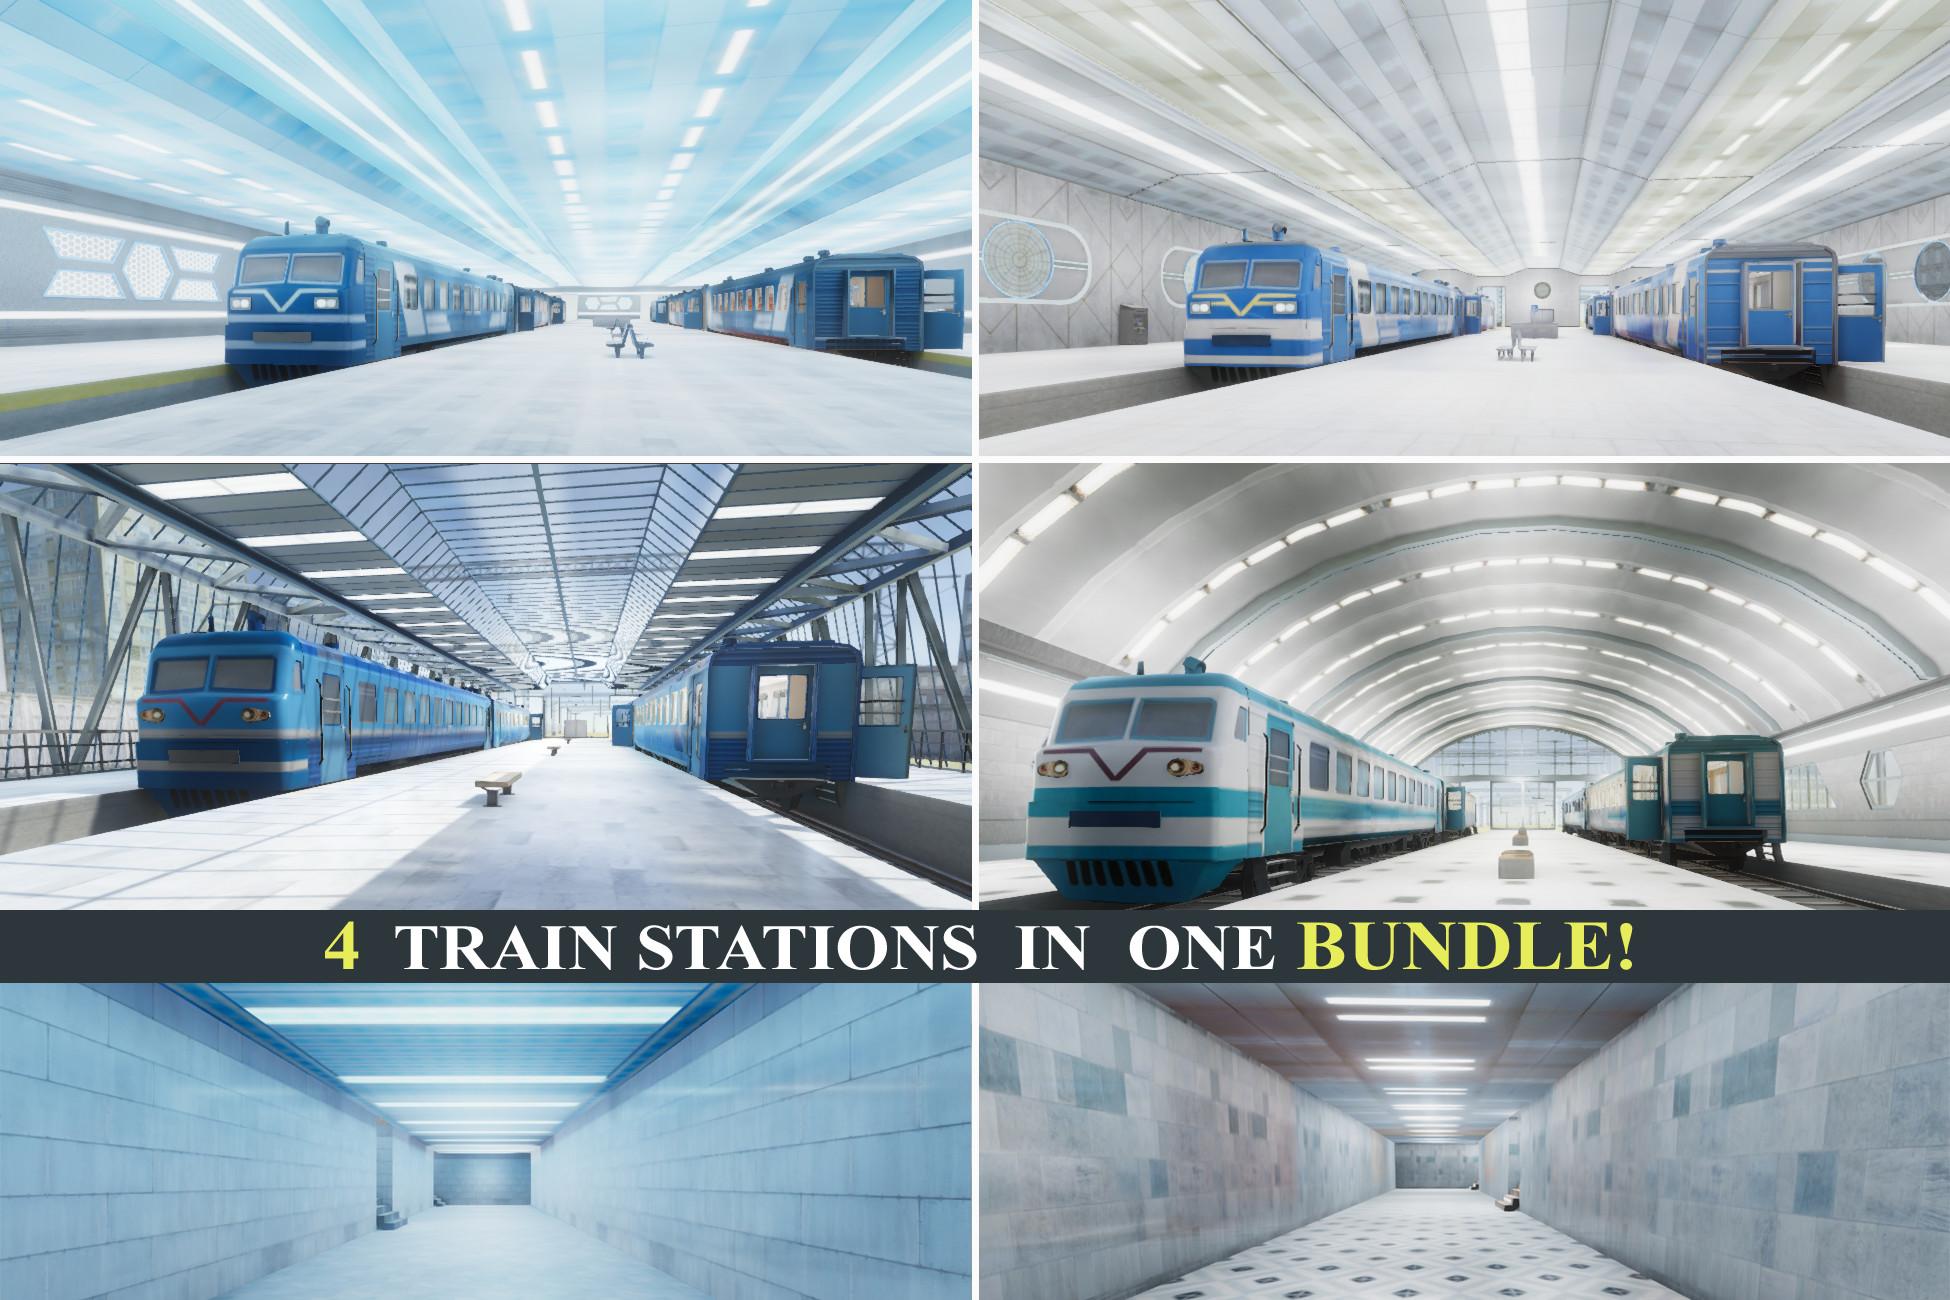 Train Stations Bundle